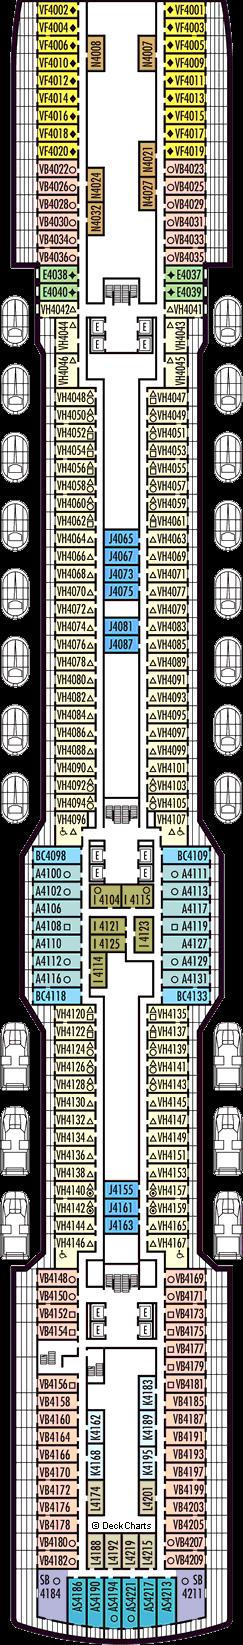 Koningsdam Deck 4 Beethoven Deck Cruise Critic